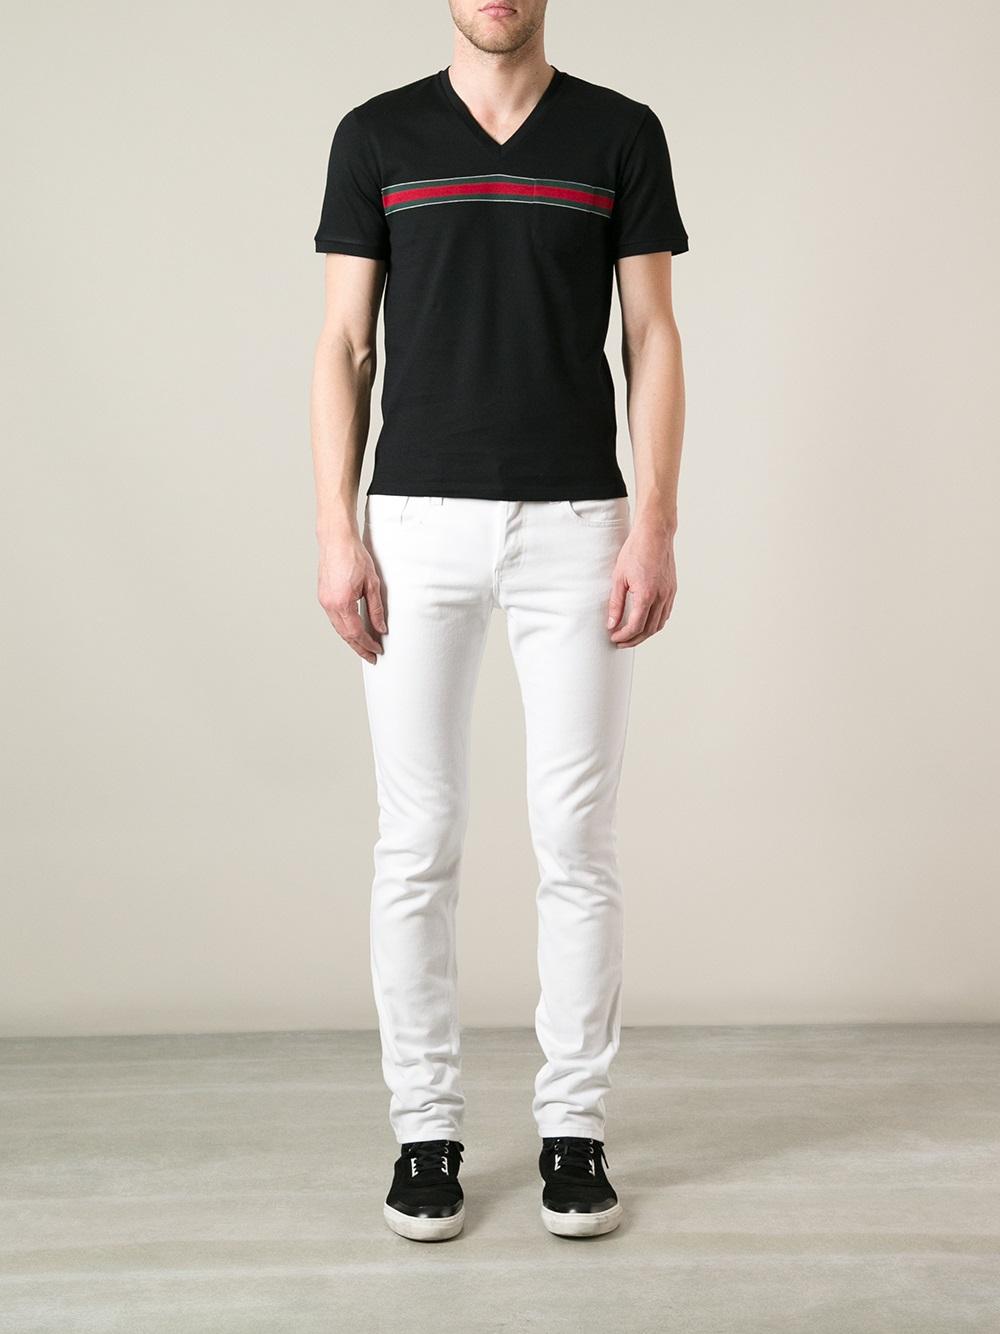 bda20eee Gucci Vneck Tshirt in Black for Men - Lyst